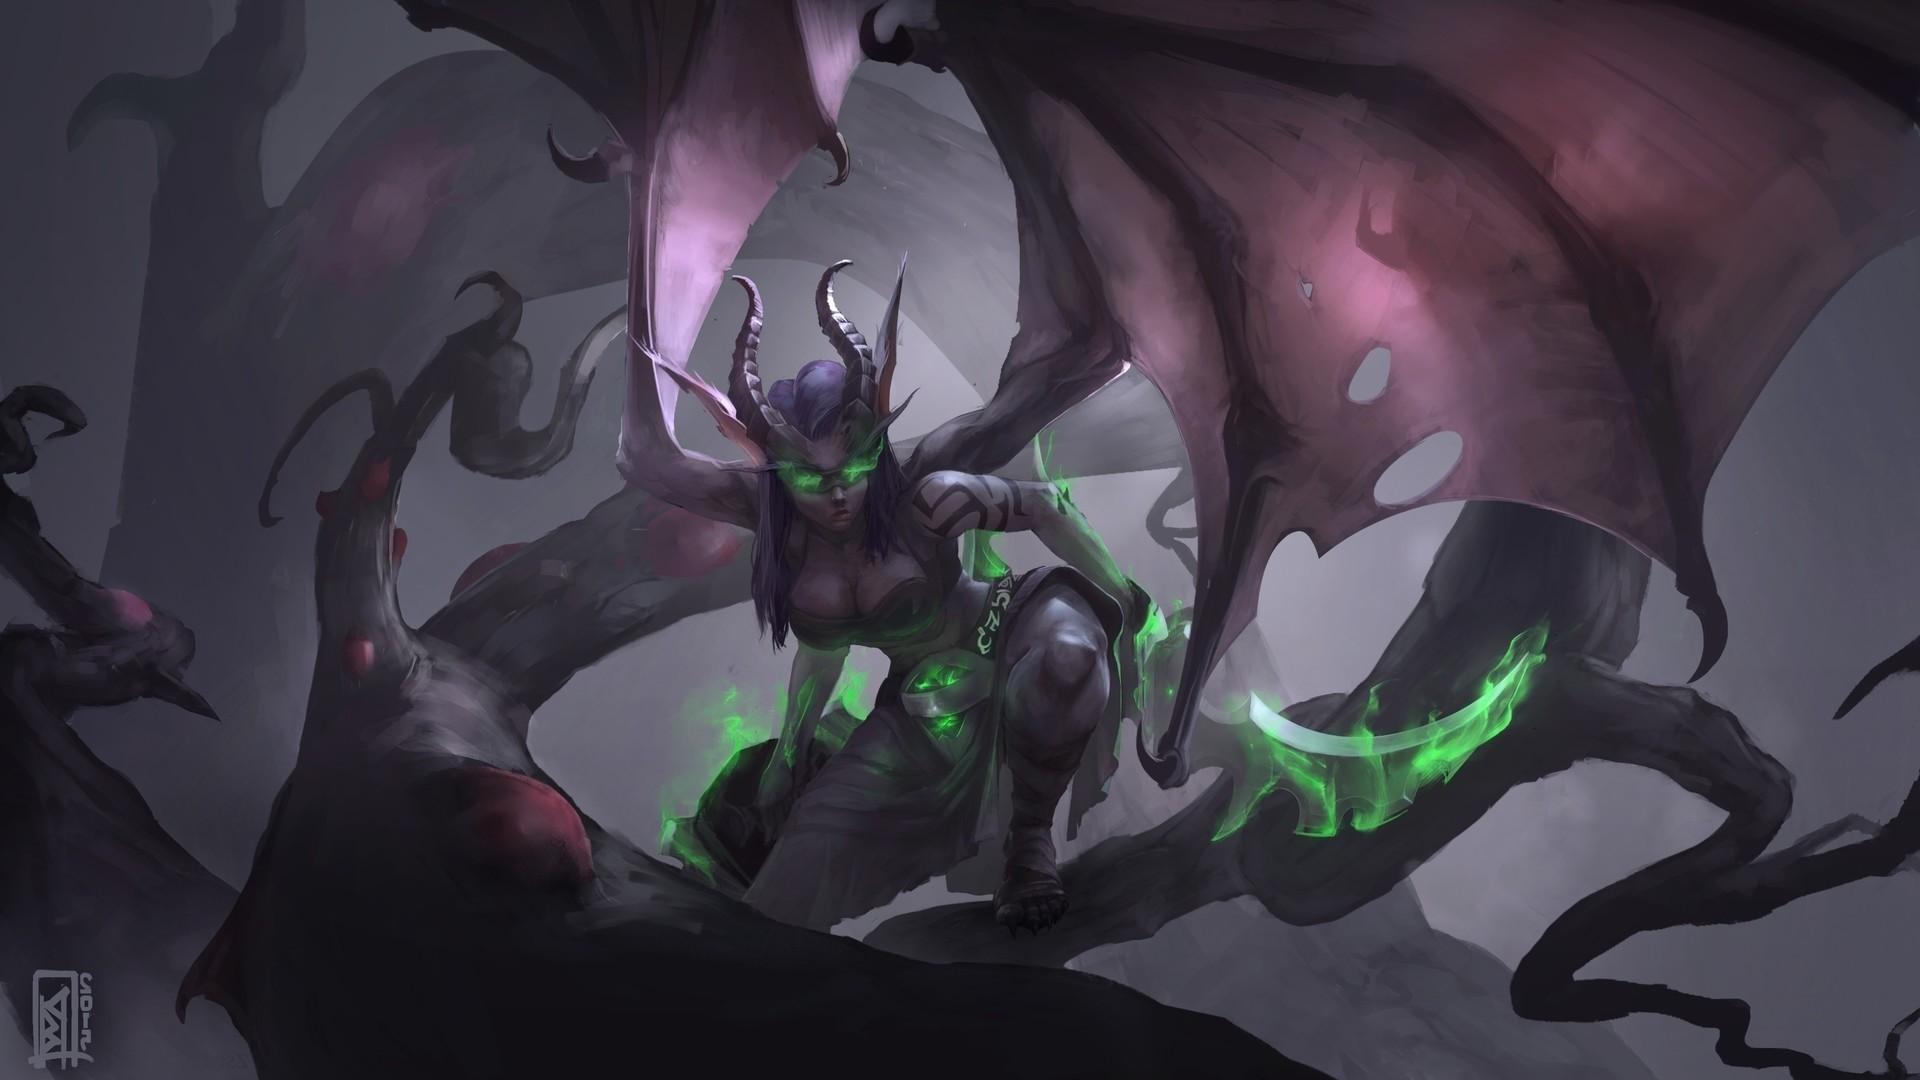 Demon Hunter hd wallpaper for pc